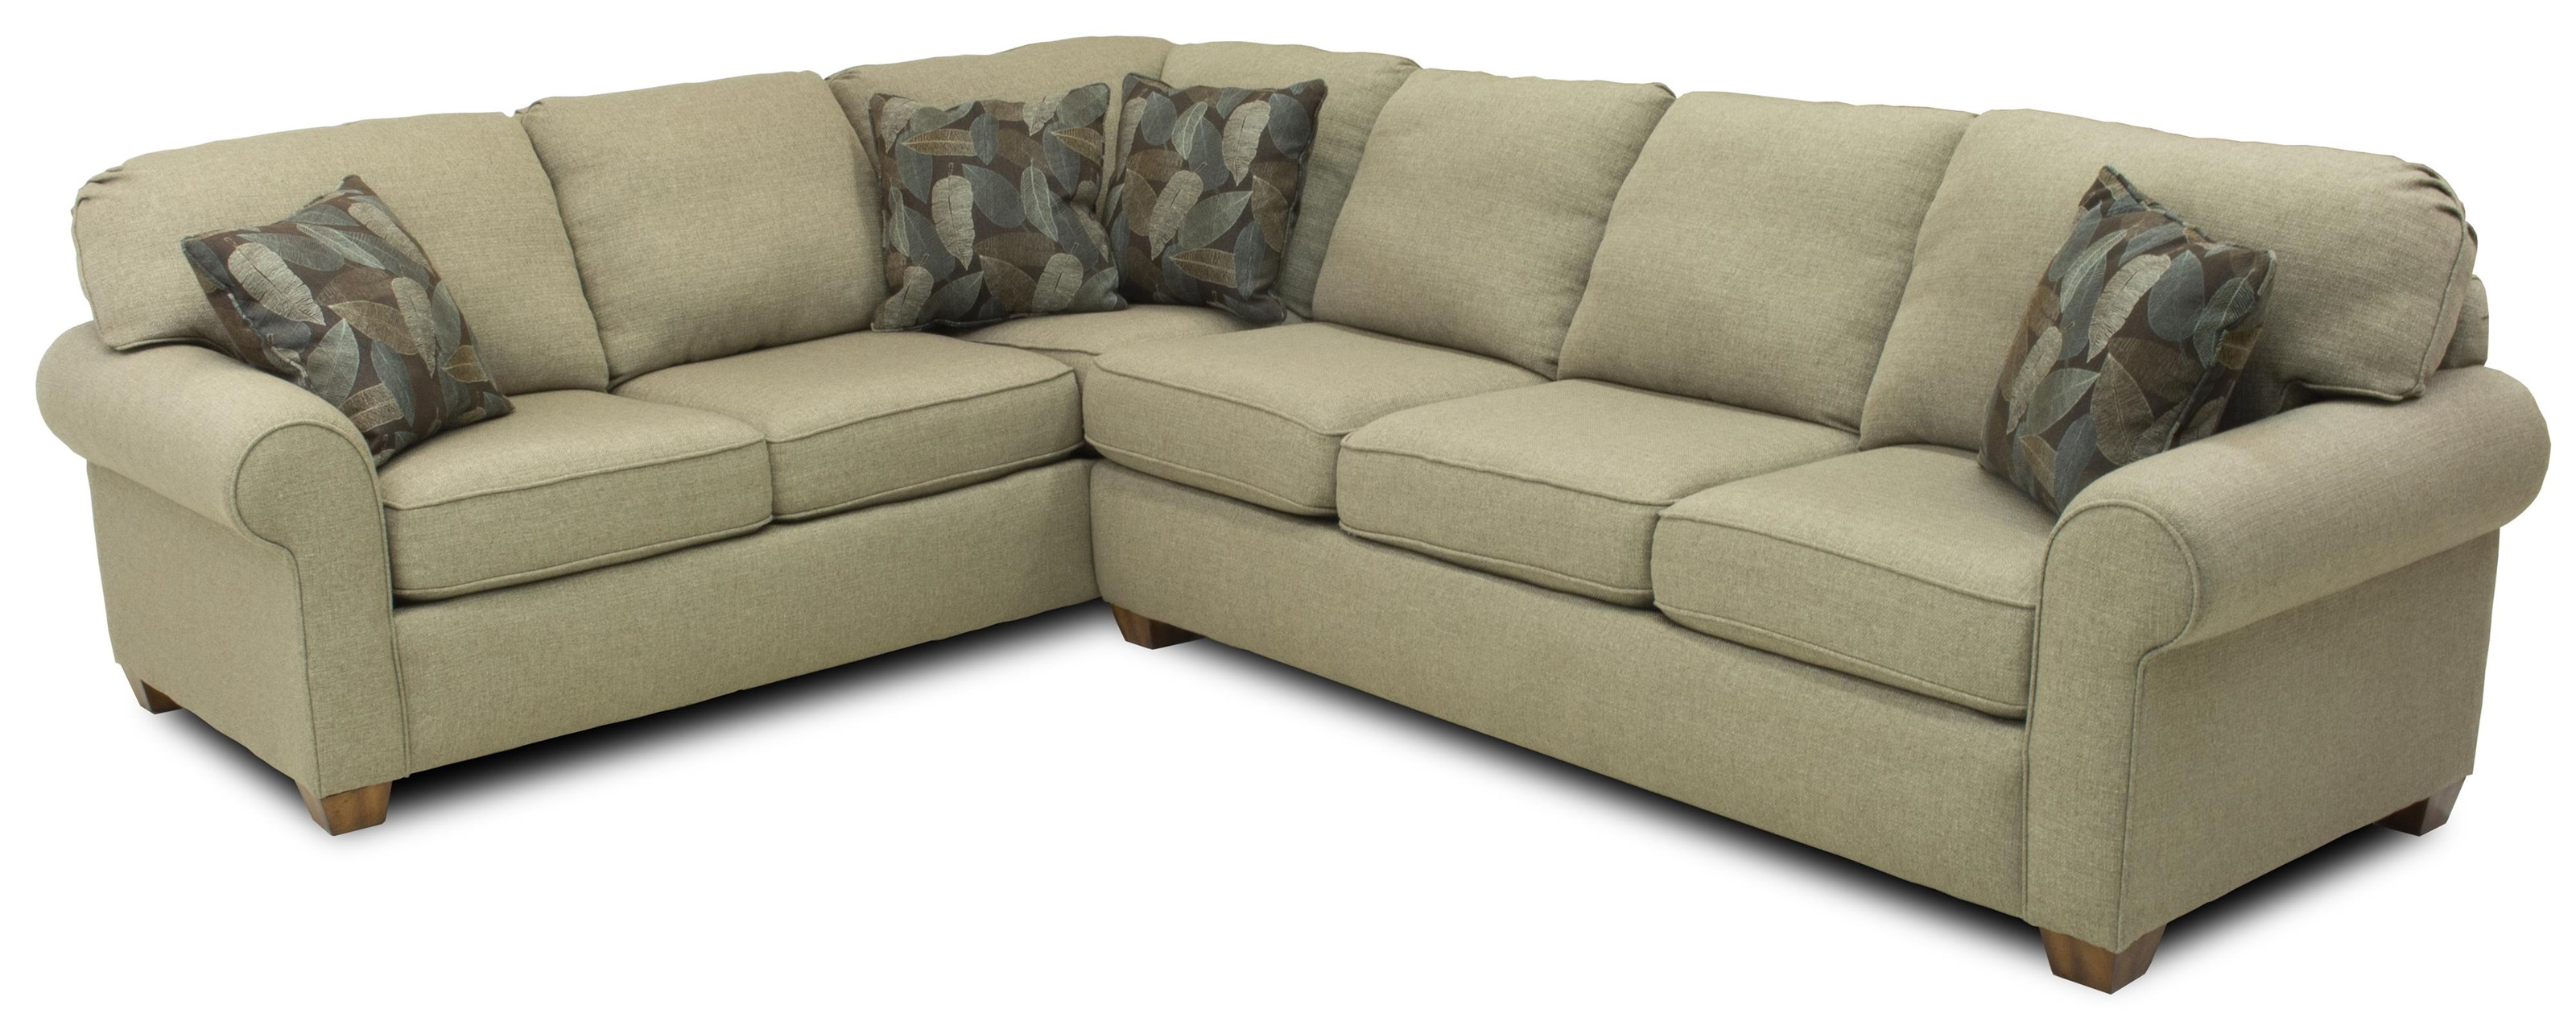 flexsteel thornton sectional sofa outdoor sofas auckland 2 piece ruby gordon home